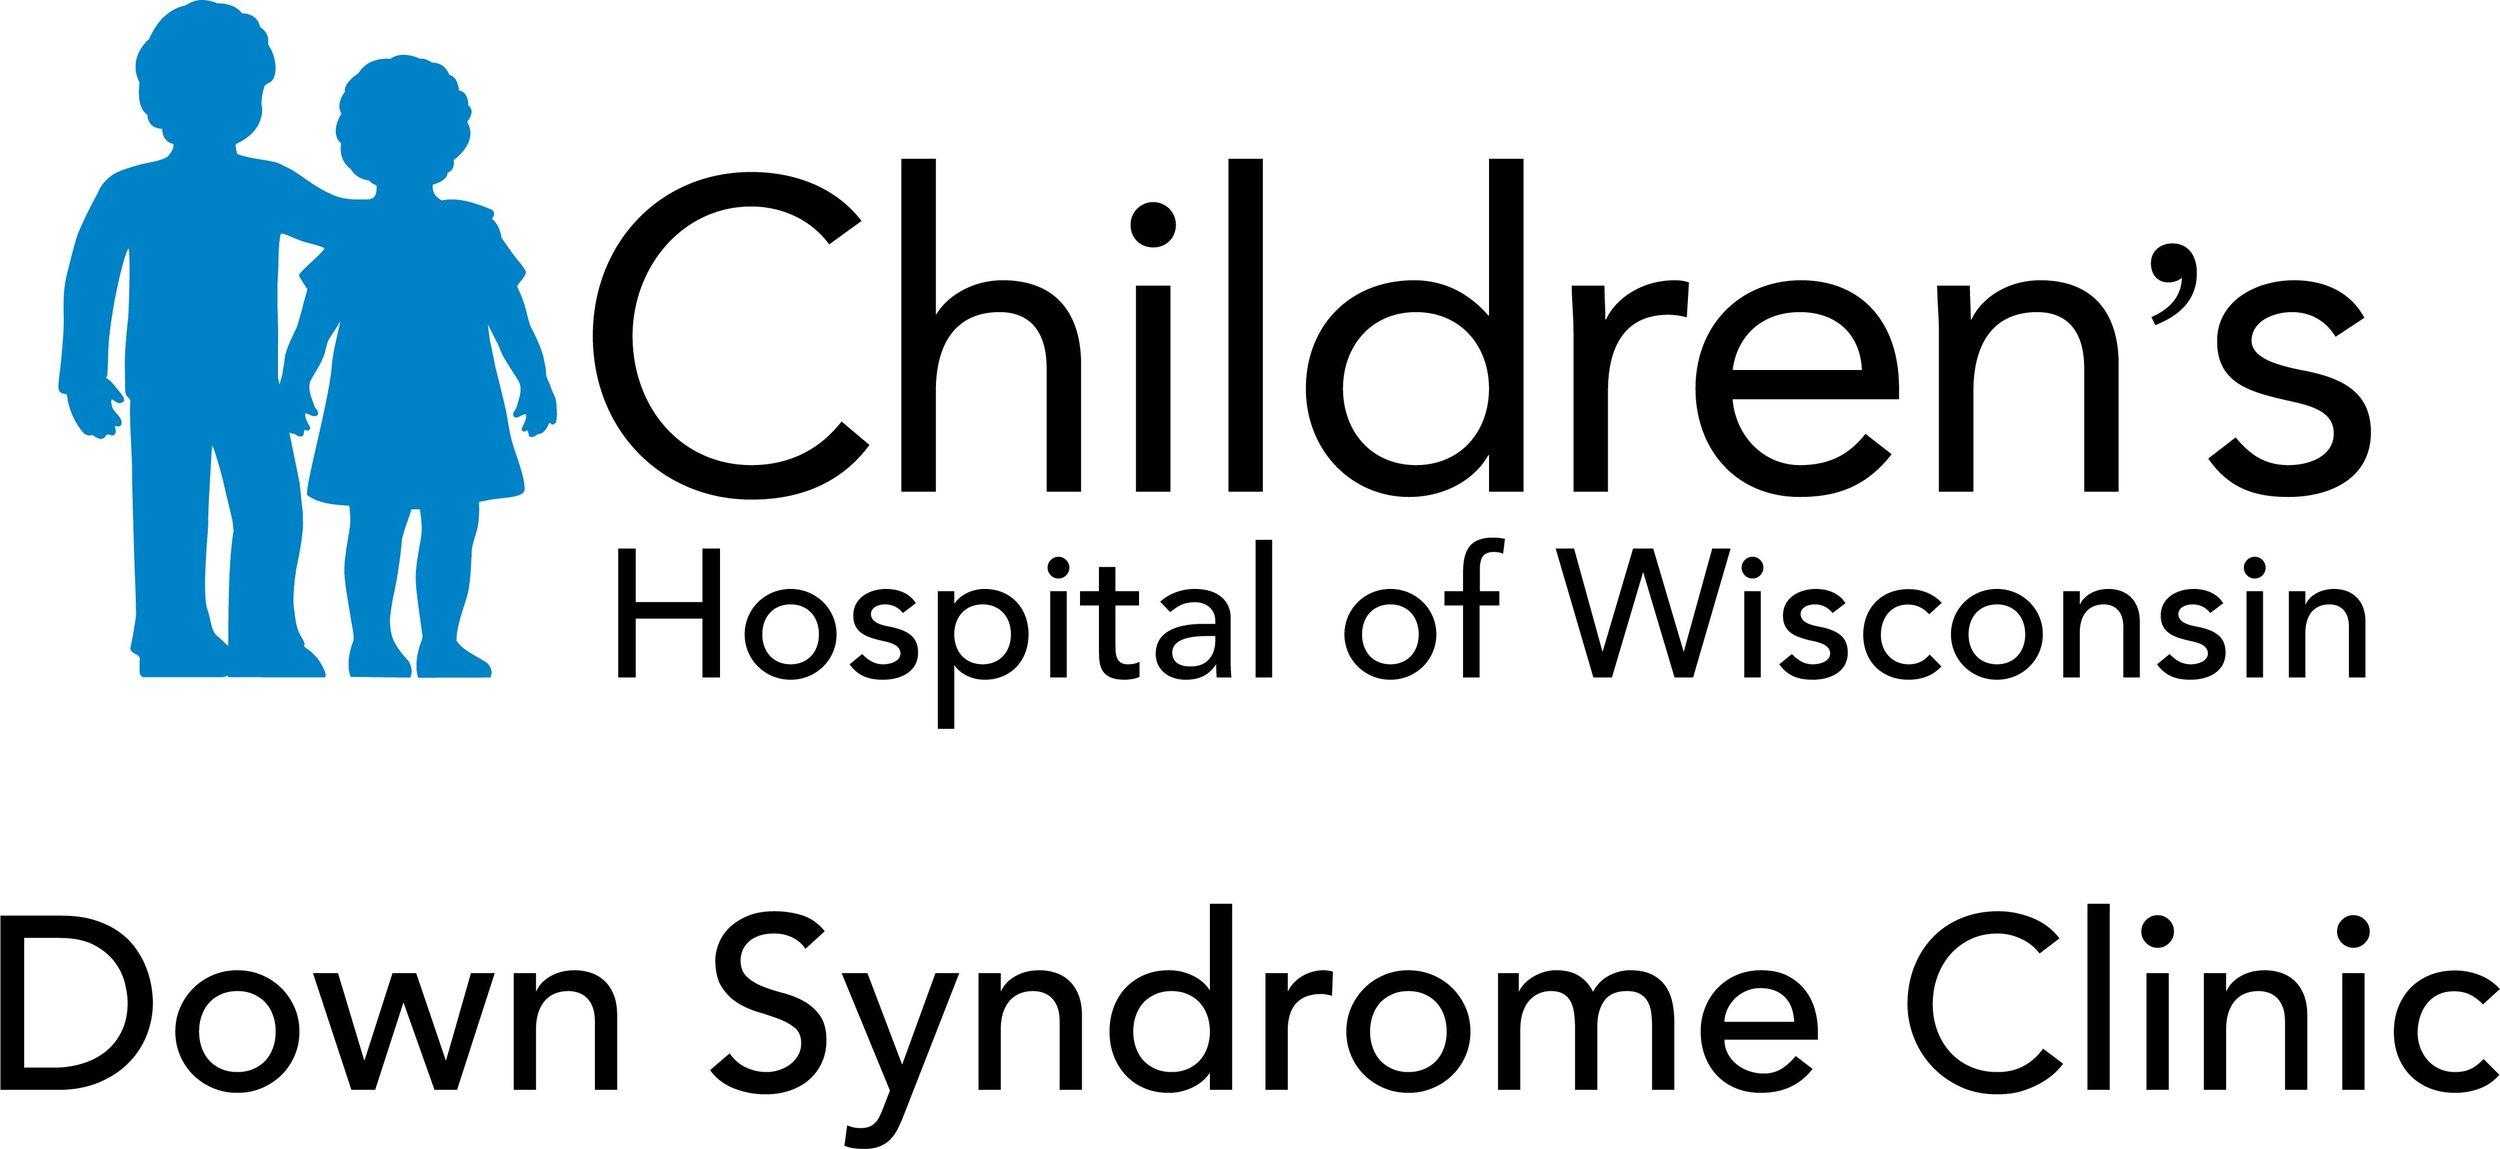 CHW DS Clinic.jpg